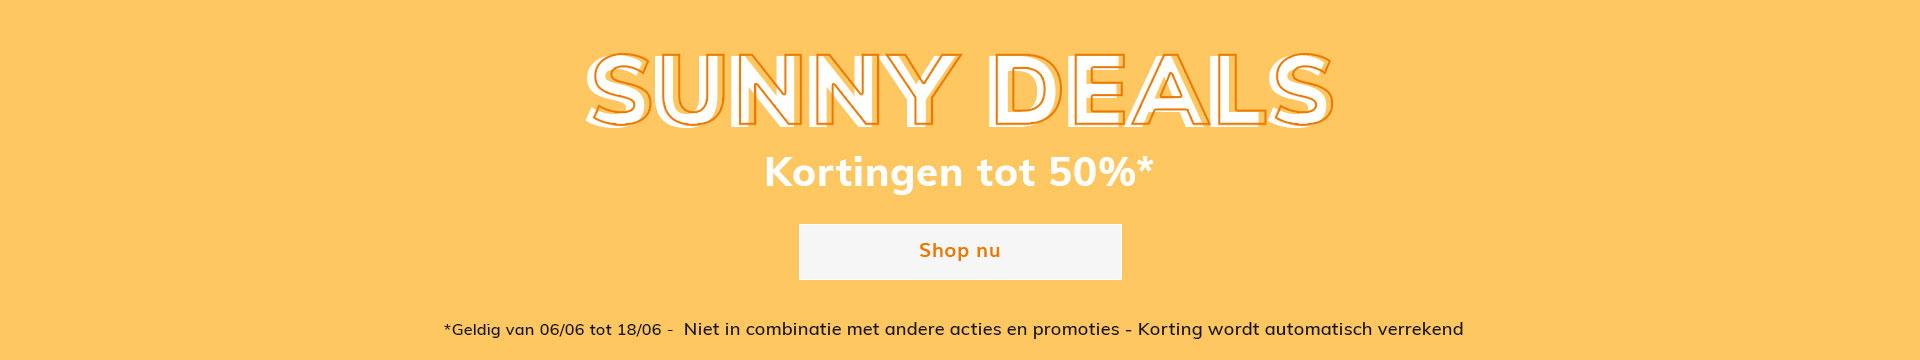 happy deals